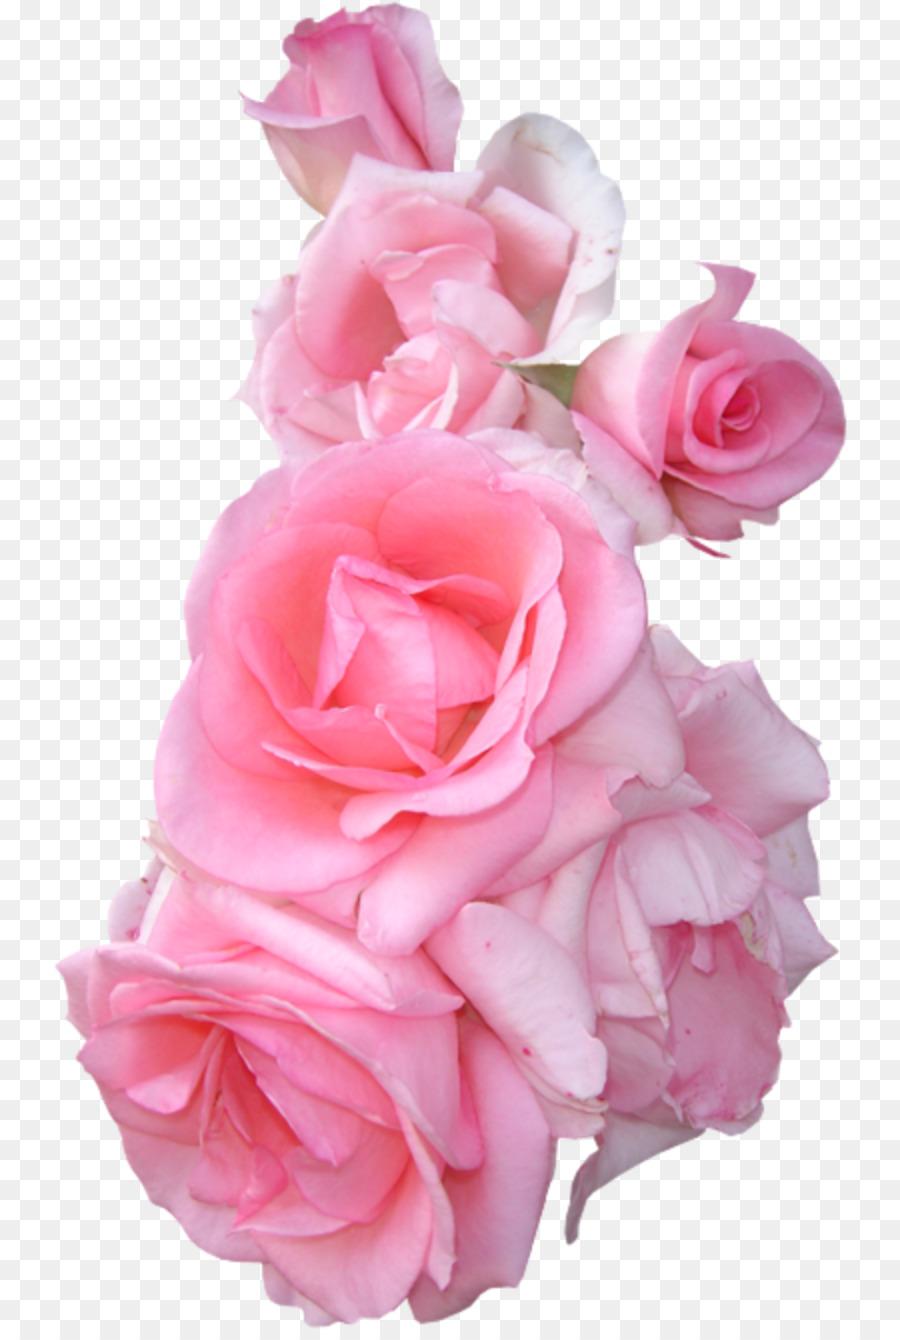 Garden Roses Flower Bouquet Pink Flower Border Png Download 800